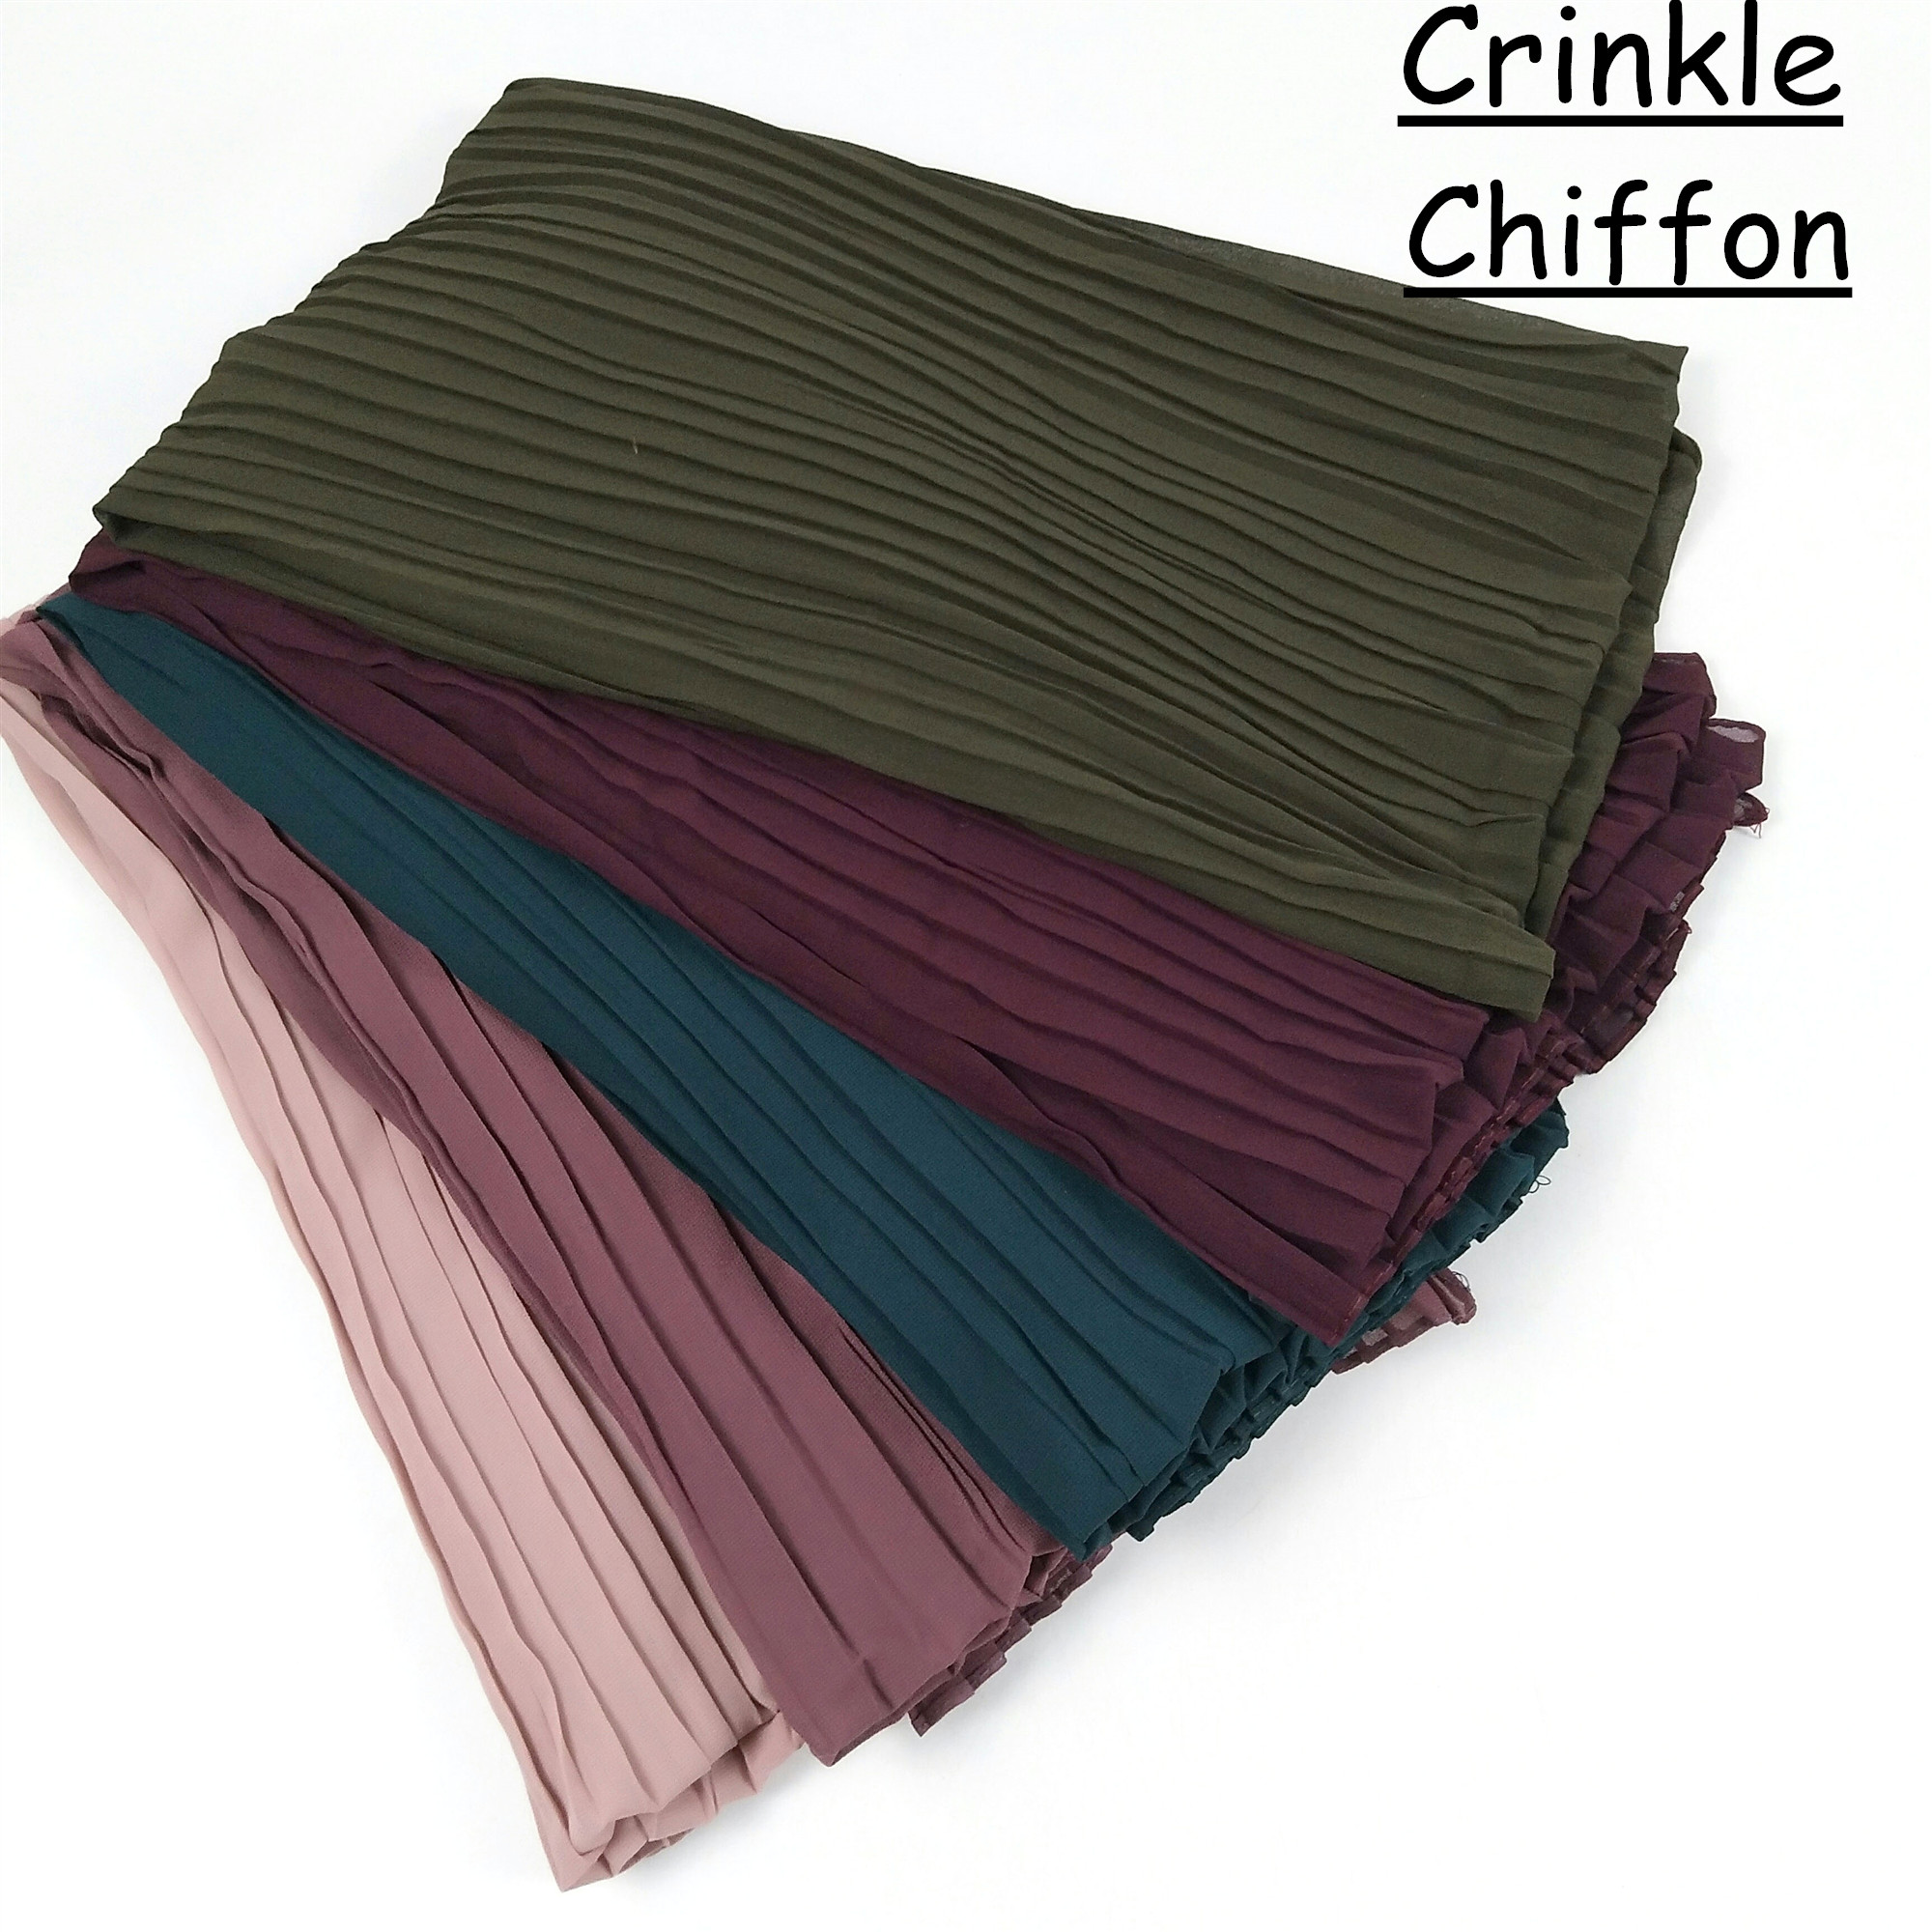 S94 5pcs High quality crinkle chiffon hijab   scarf     wrap   shawls chiffon hijab long   wrap   headband women   scarf  /  scarves